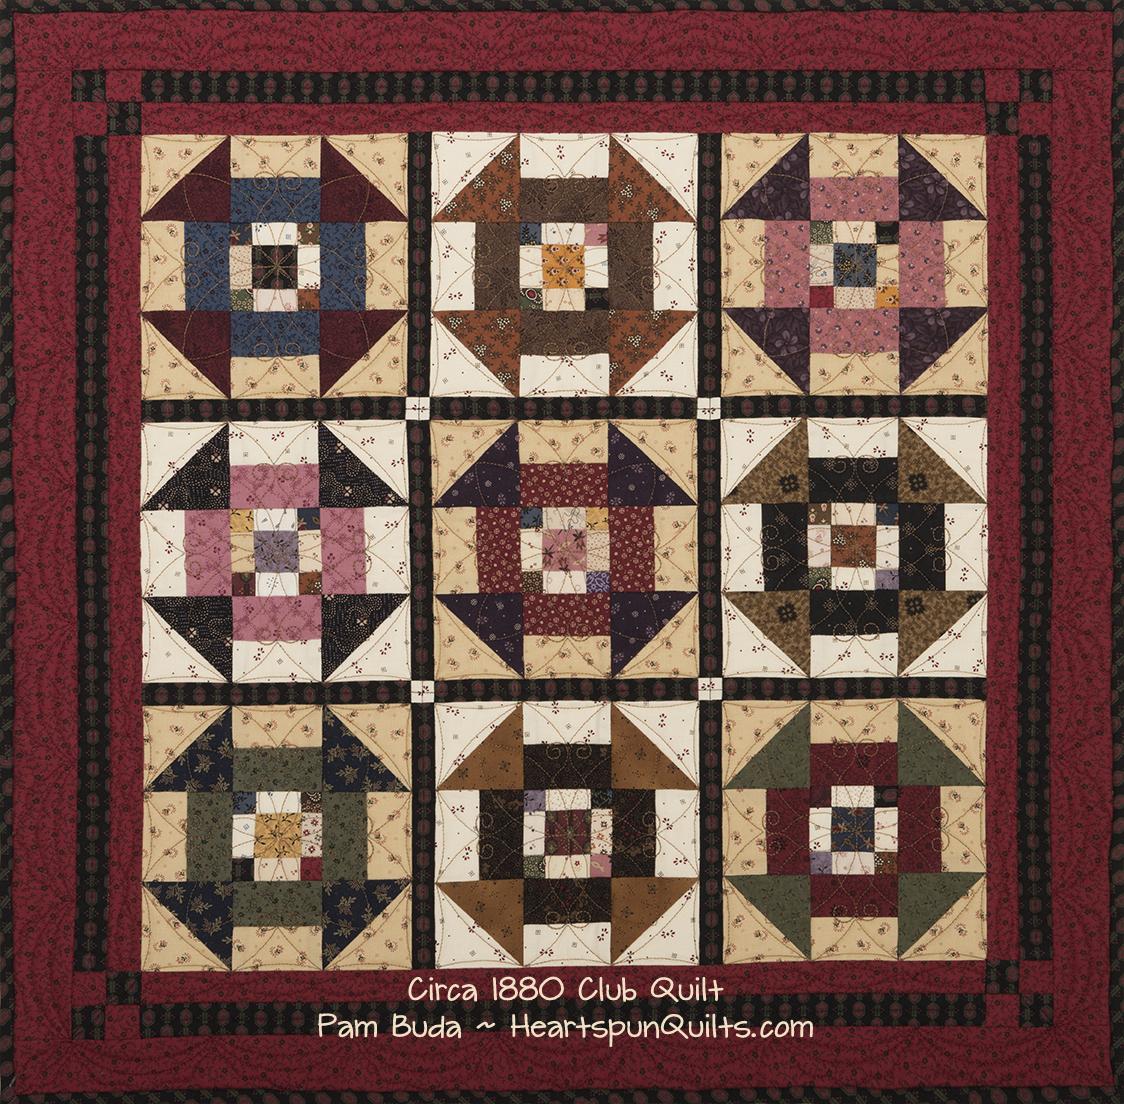 Heartspun Quilts Pam Buda The Circa 1880 Club Quilts